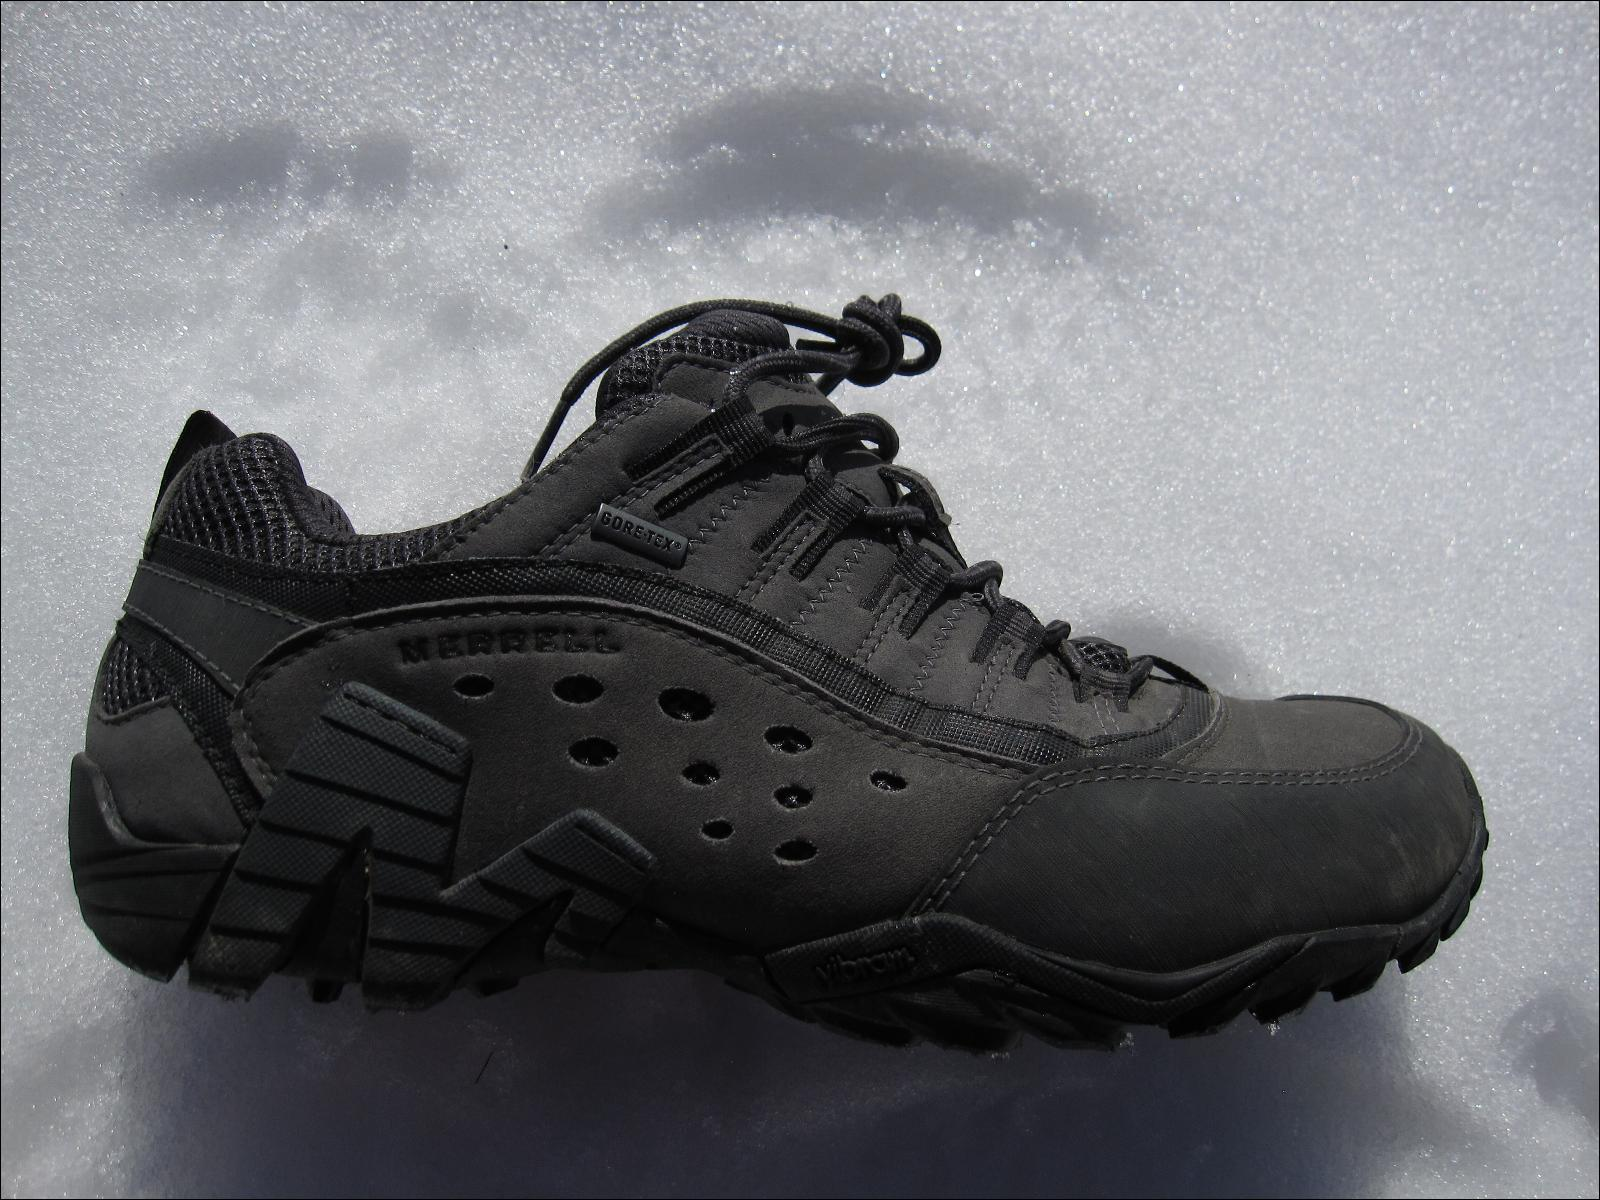 Gore Comparatif Tige Chaussures Basse Tex qqpa1xz